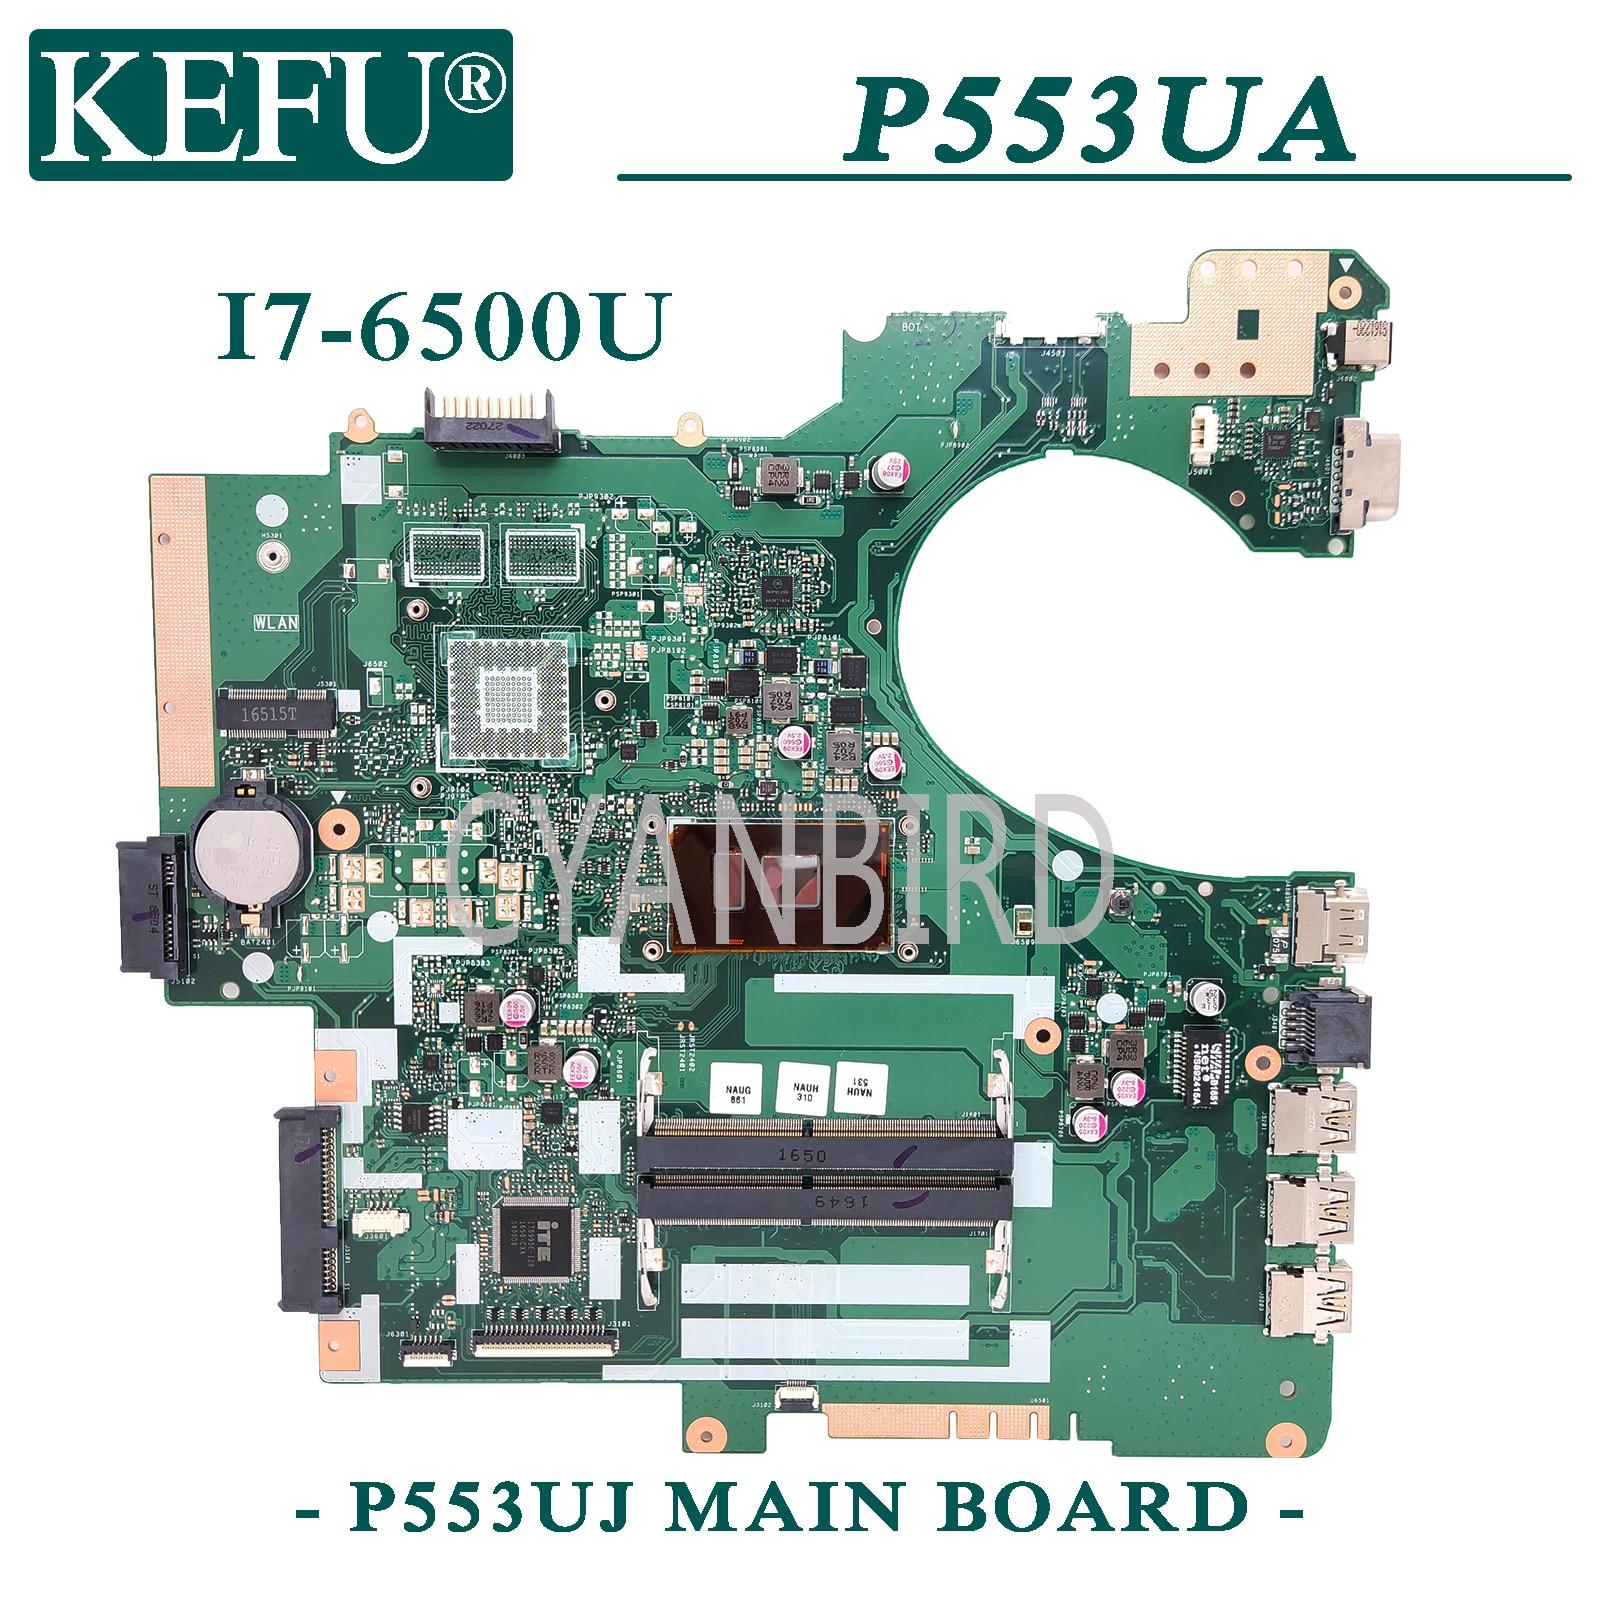 KEFU P553UJ اللوحة الأصلية ل ASUS P553UA PRO553UJ مع I7-6500U GM اللوحة المحمول